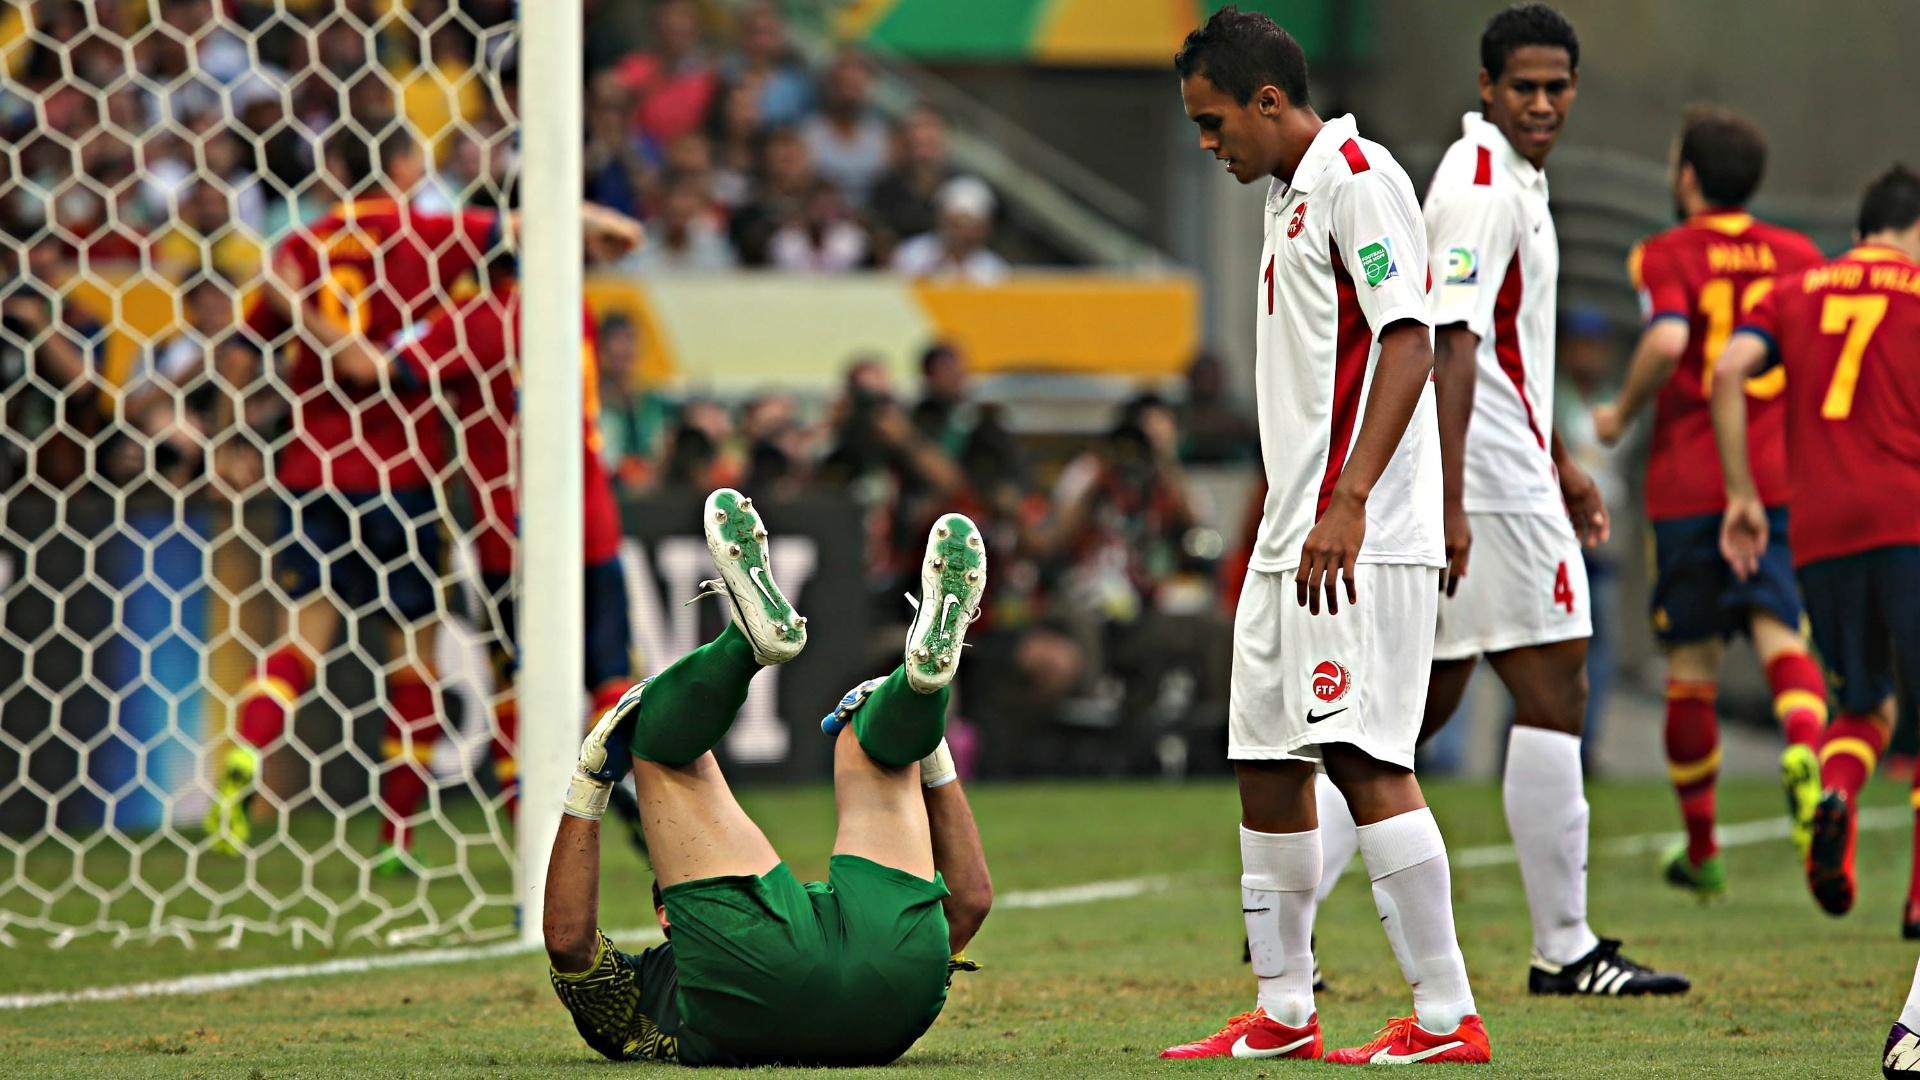 20.junho.2013 - Jogador do Taiti observa goleiro caído